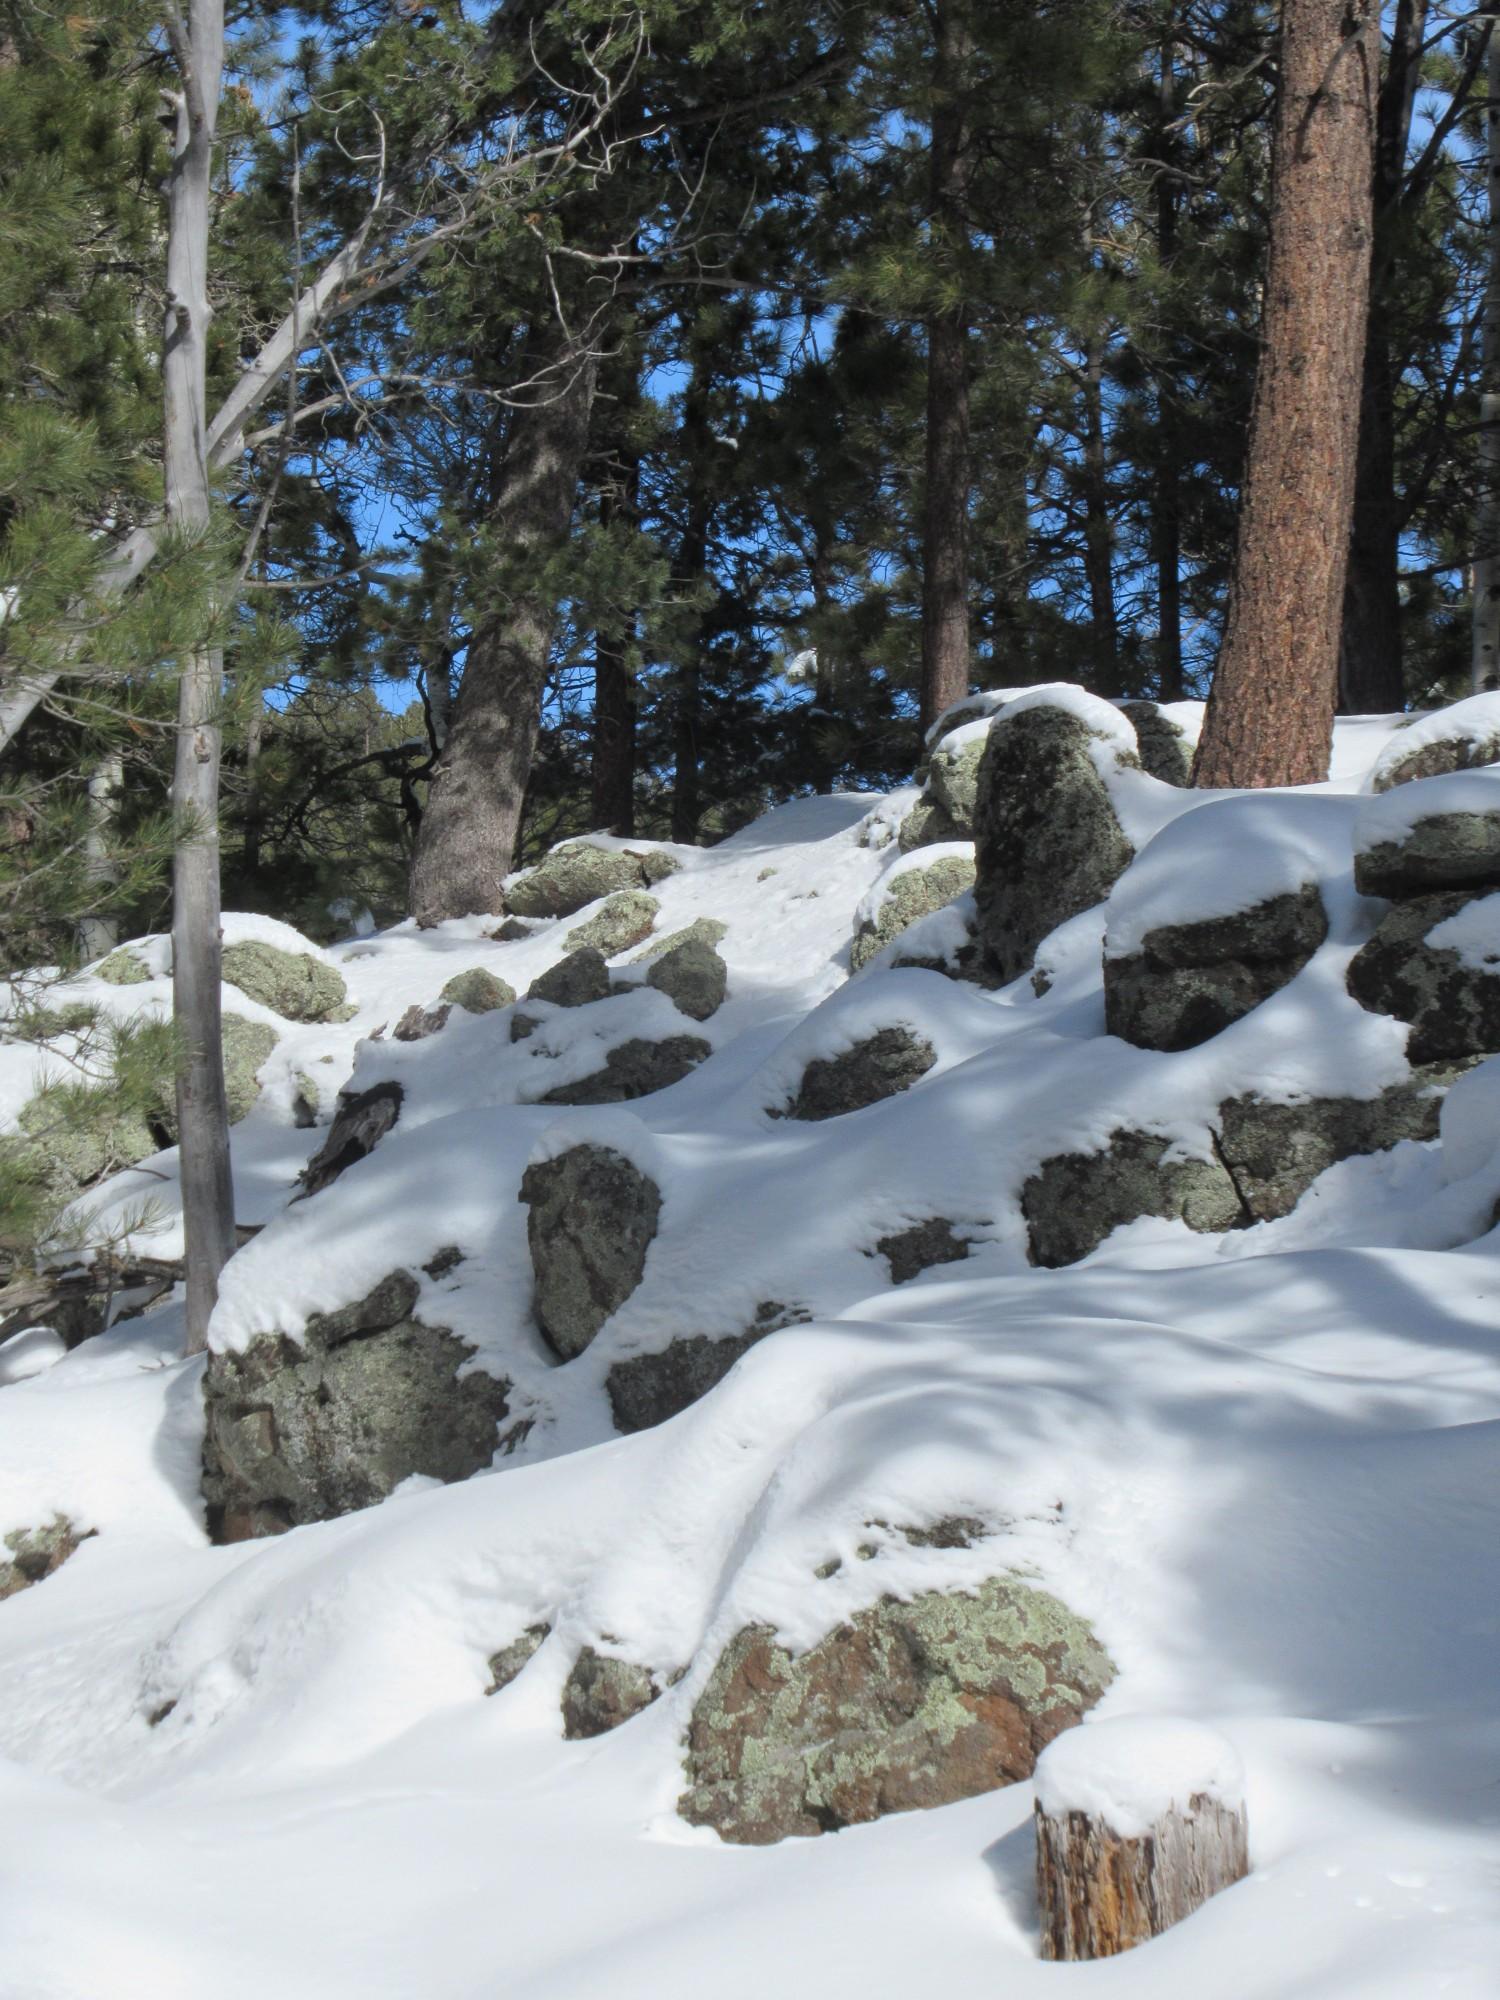 volcanic rocks while snowshoeing at Arizona Nordic Village in Flagstaff